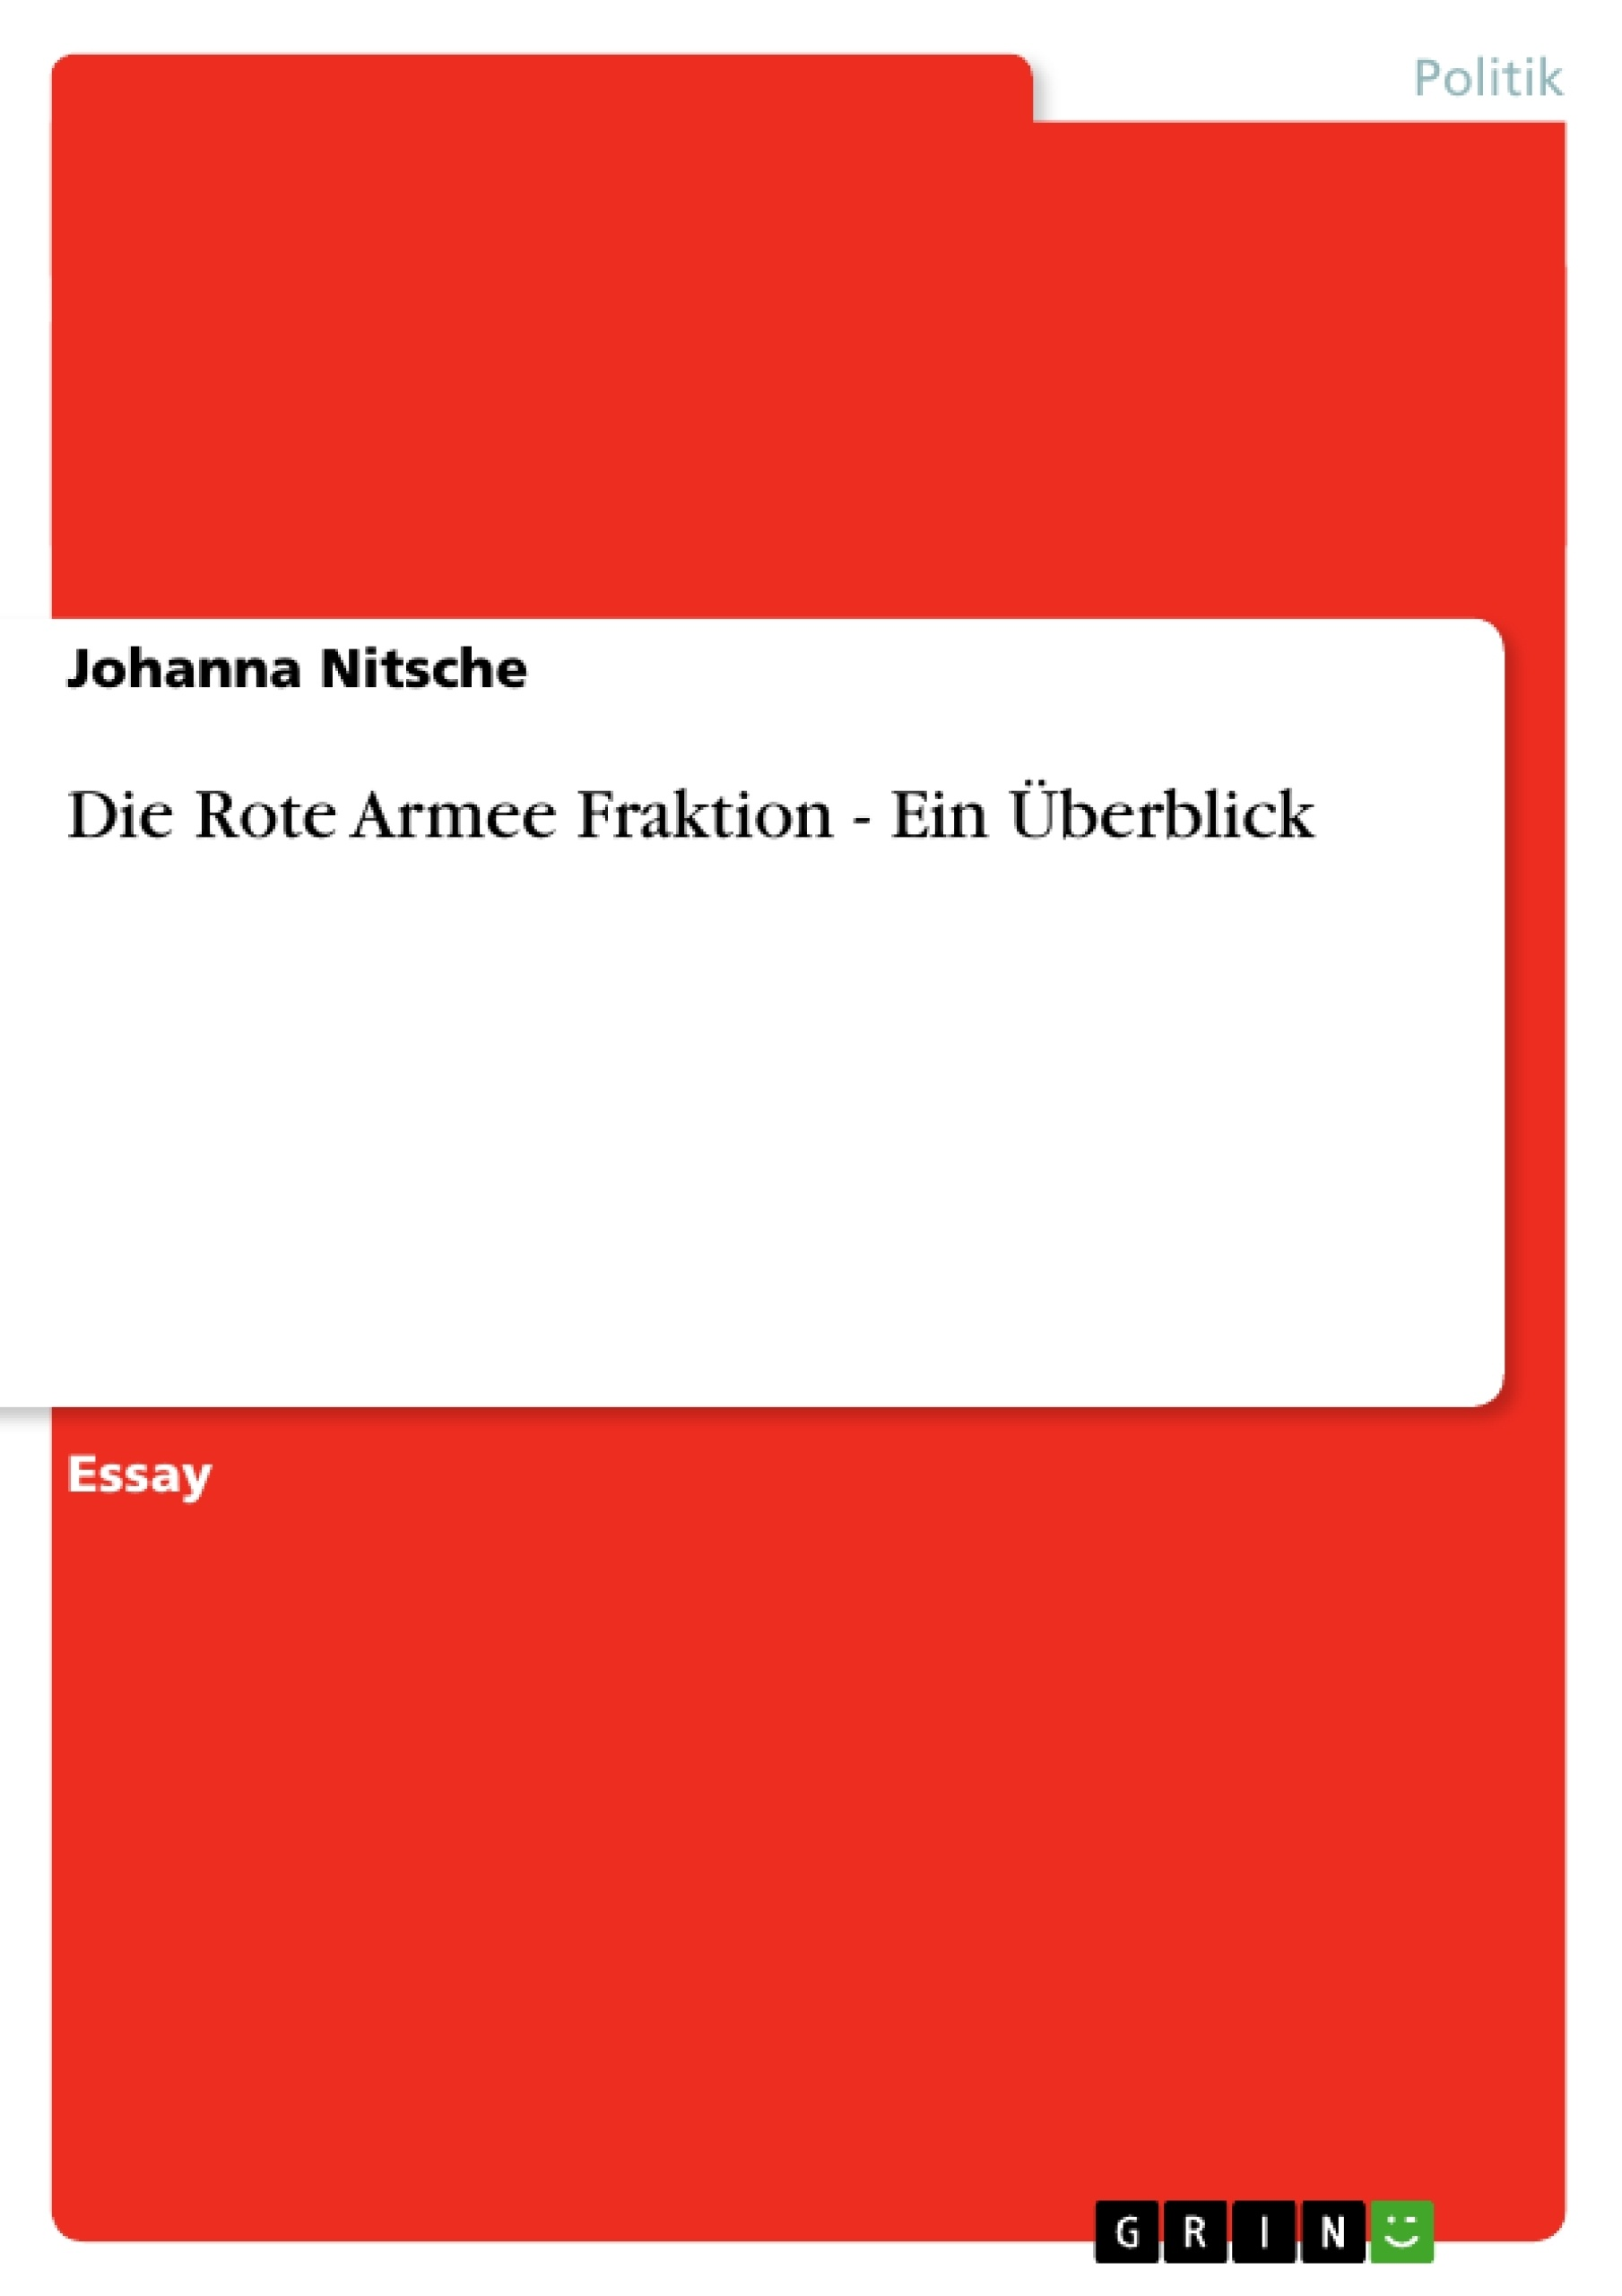 Titel: Die Rote Armee Fraktion - Ein Überblick